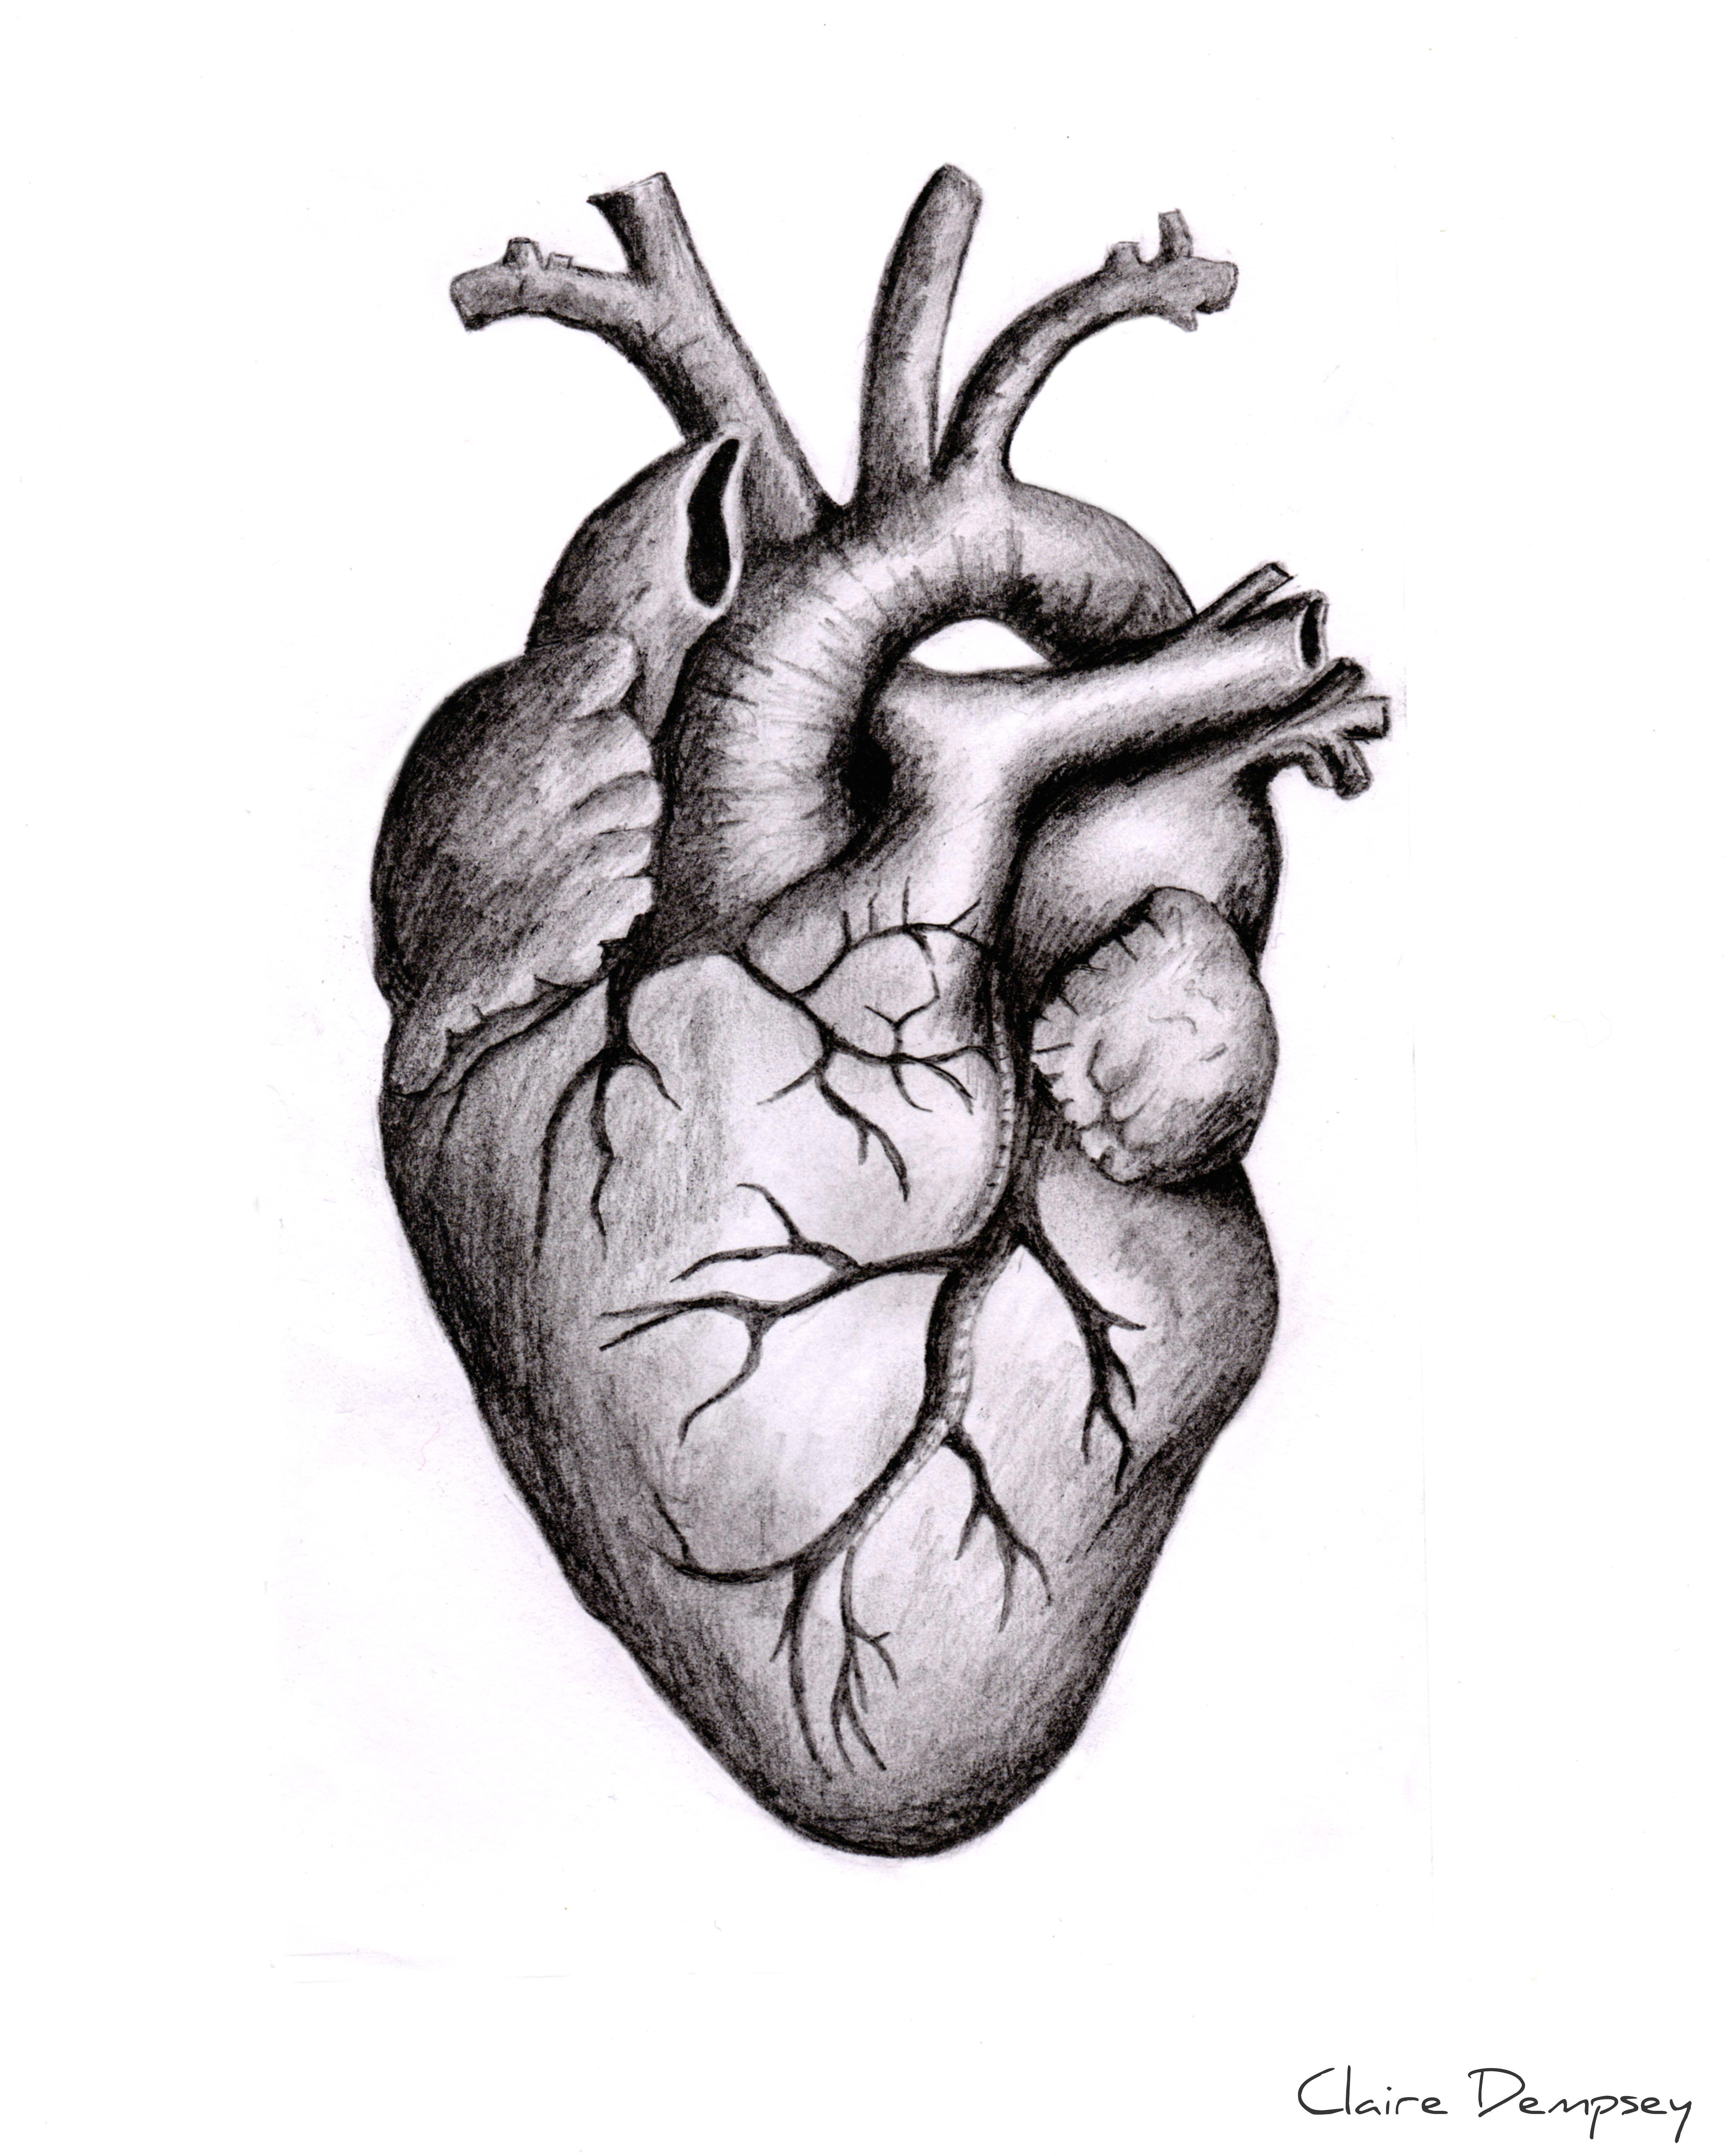 anatomically correct human heart by niku arbabi embroidery